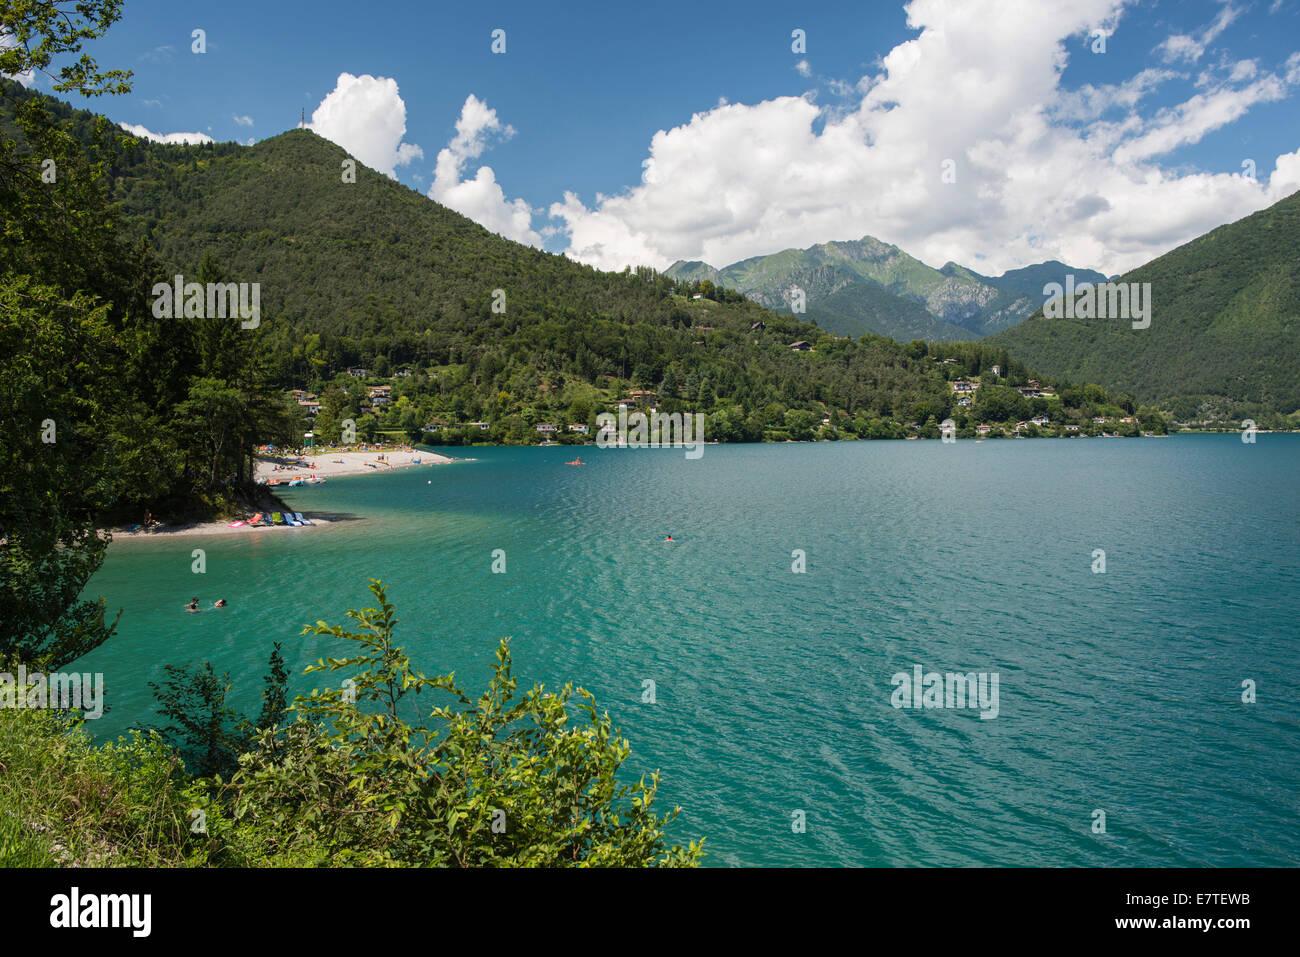 Lago di Ledro and Lake Ledro, Ledro, Trentino-Alto Adige, Italy - Stock Image